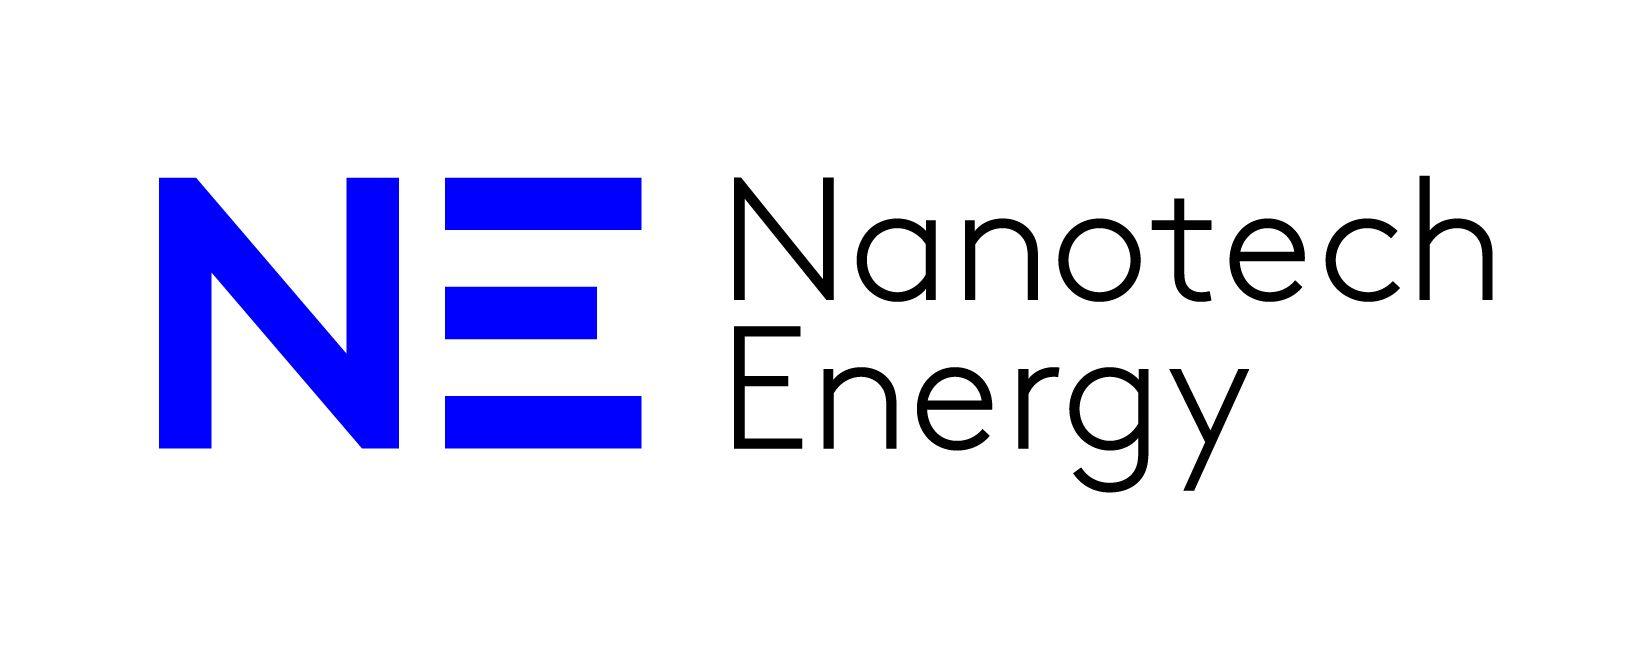 Nanotech Energy Inc